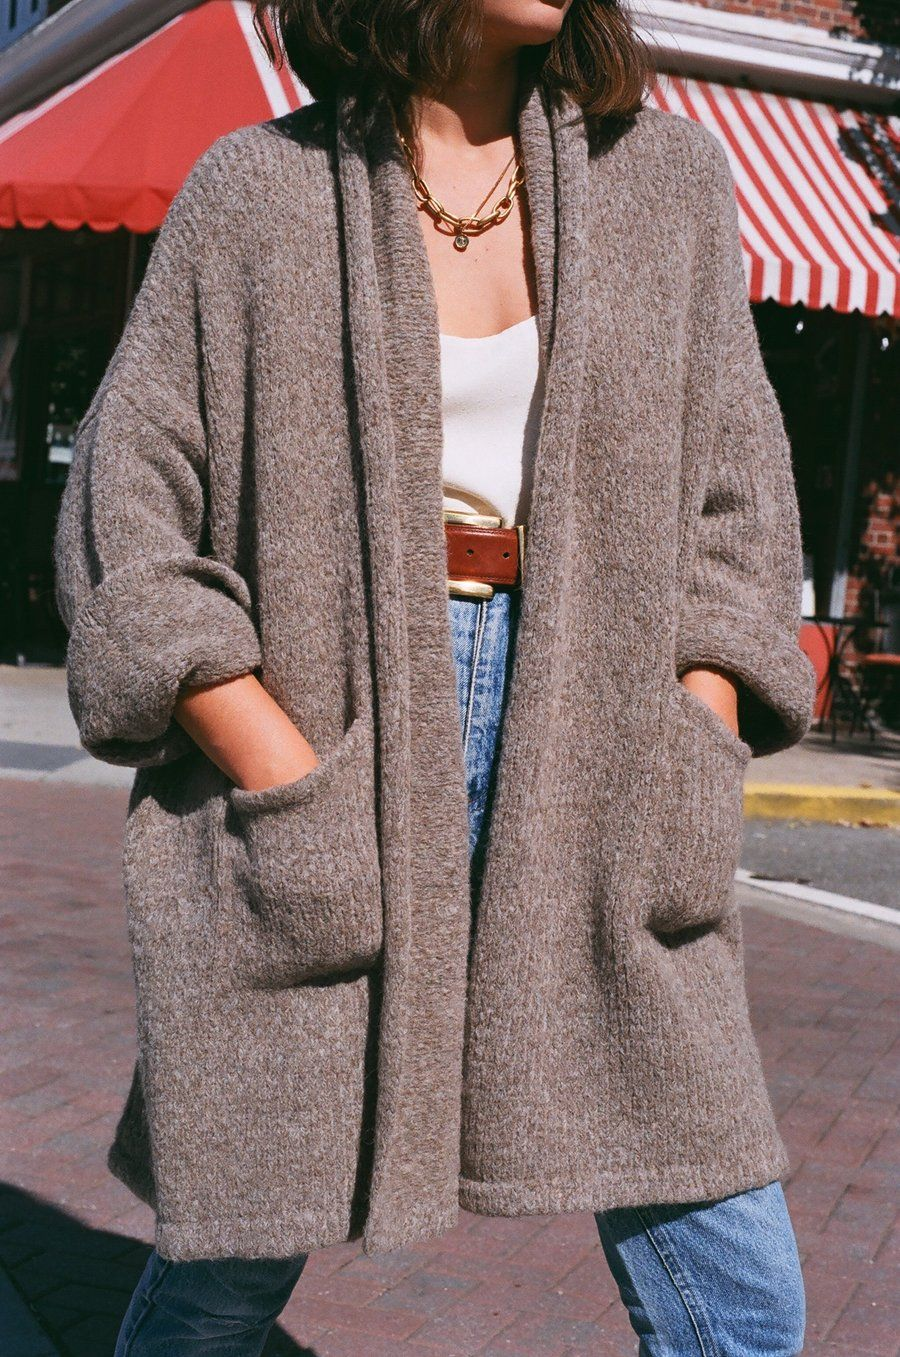 Atelier Delphine Haori Alpaca Sweater Coat / Multiple Colors Available